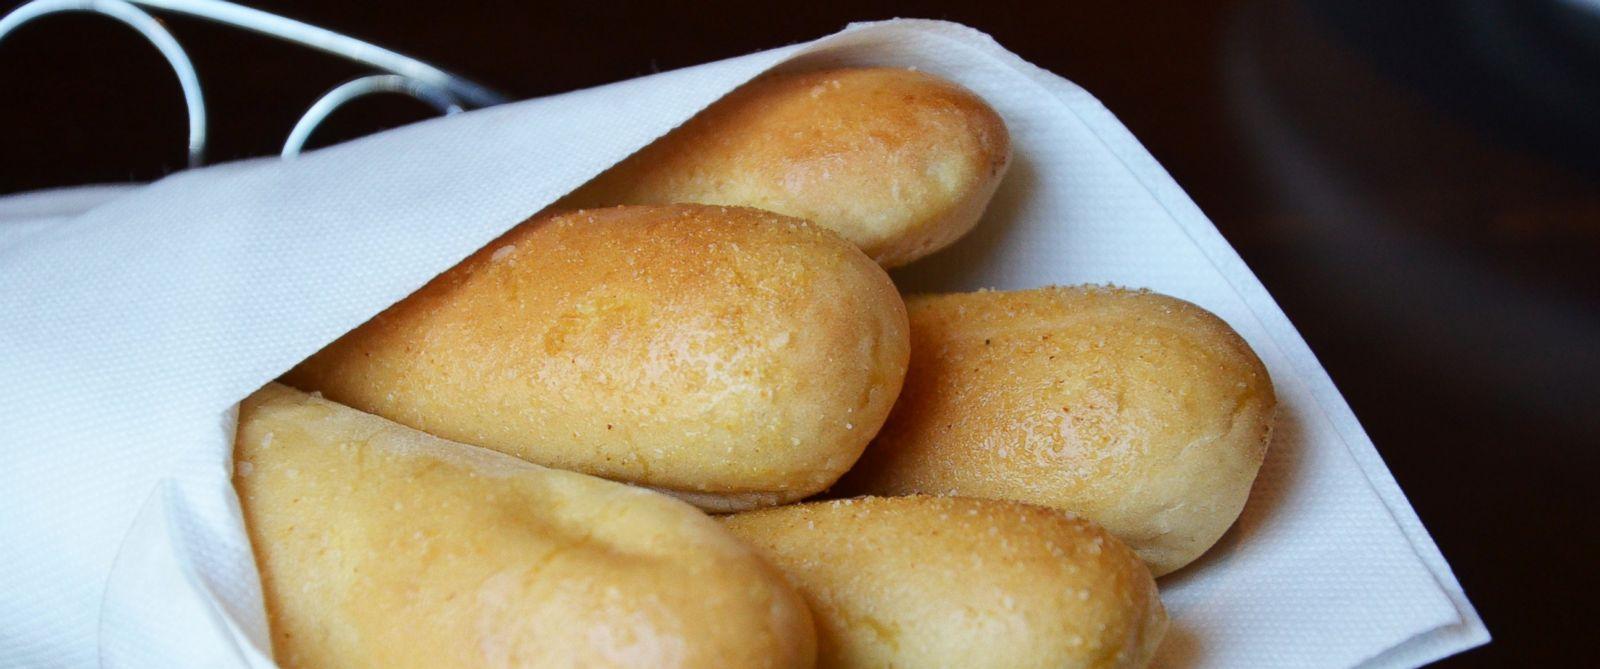 Free Bread At Restaurants Hitting Endangered Status Abc News